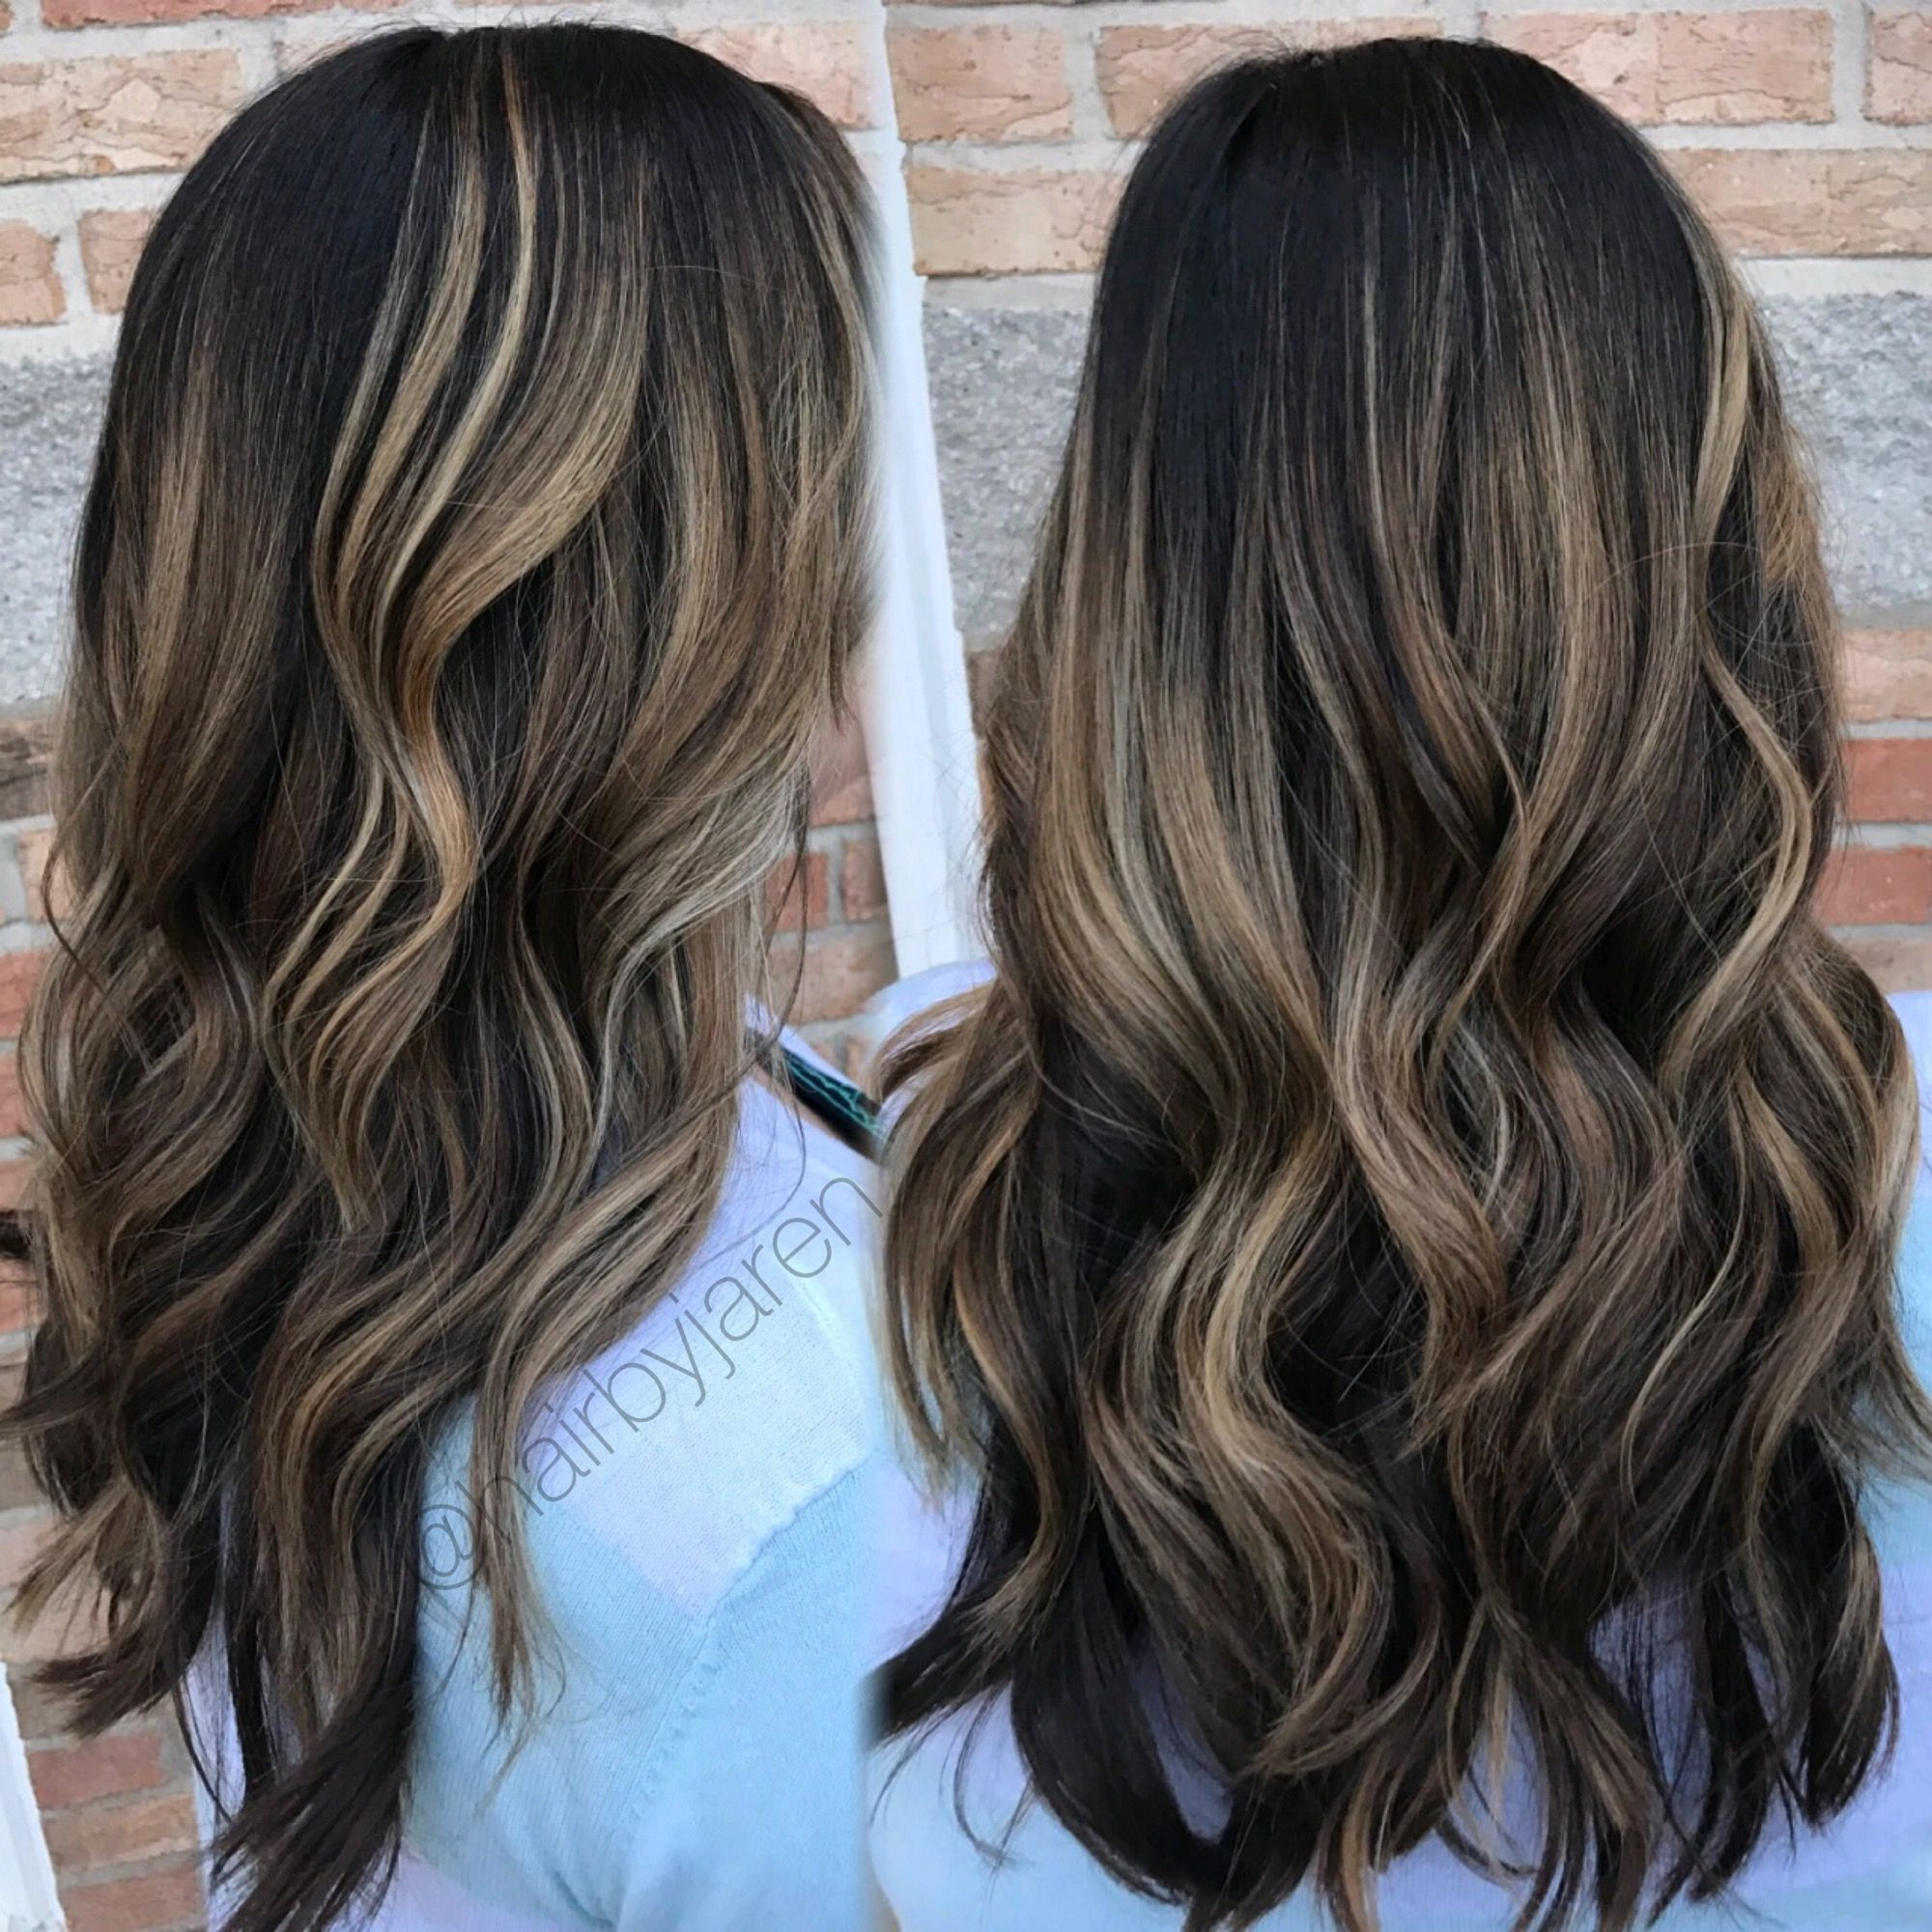 Dark Root Carmel Balayage Dark Roots Blonde Hair Blonde Hair With Roots Carmel Balayage